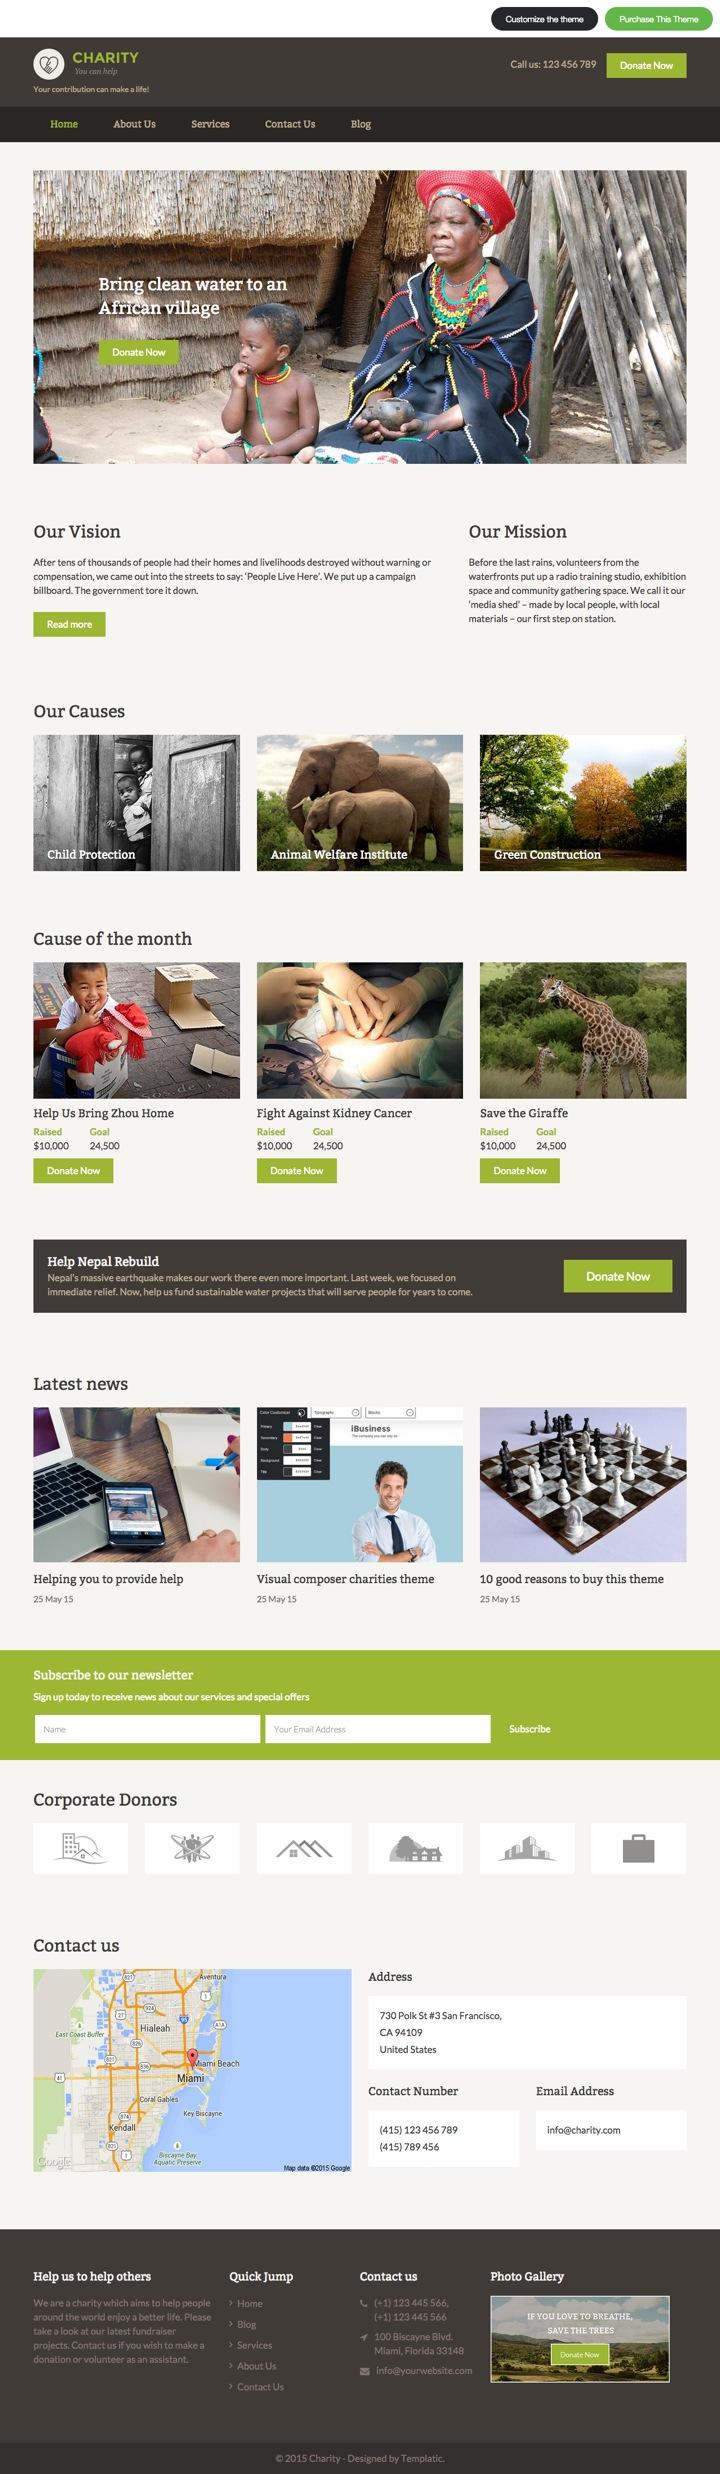 Charity WordPress Click & Edit Non-Profit Organization Theme